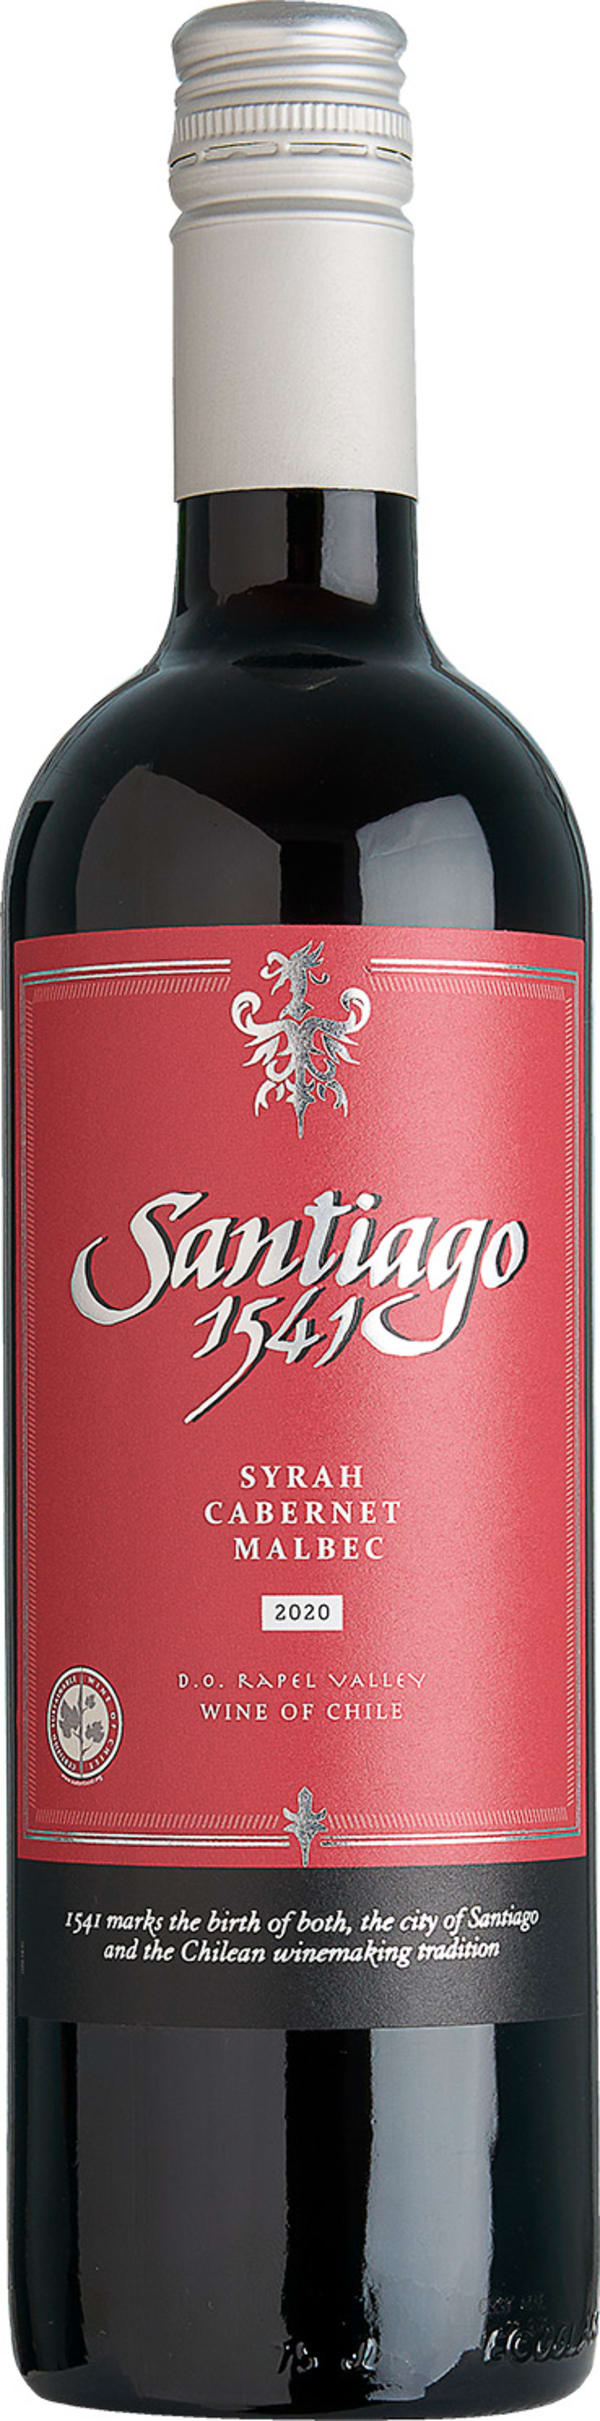 Santiago 1541 Syrah Cabernet Malbec 2018